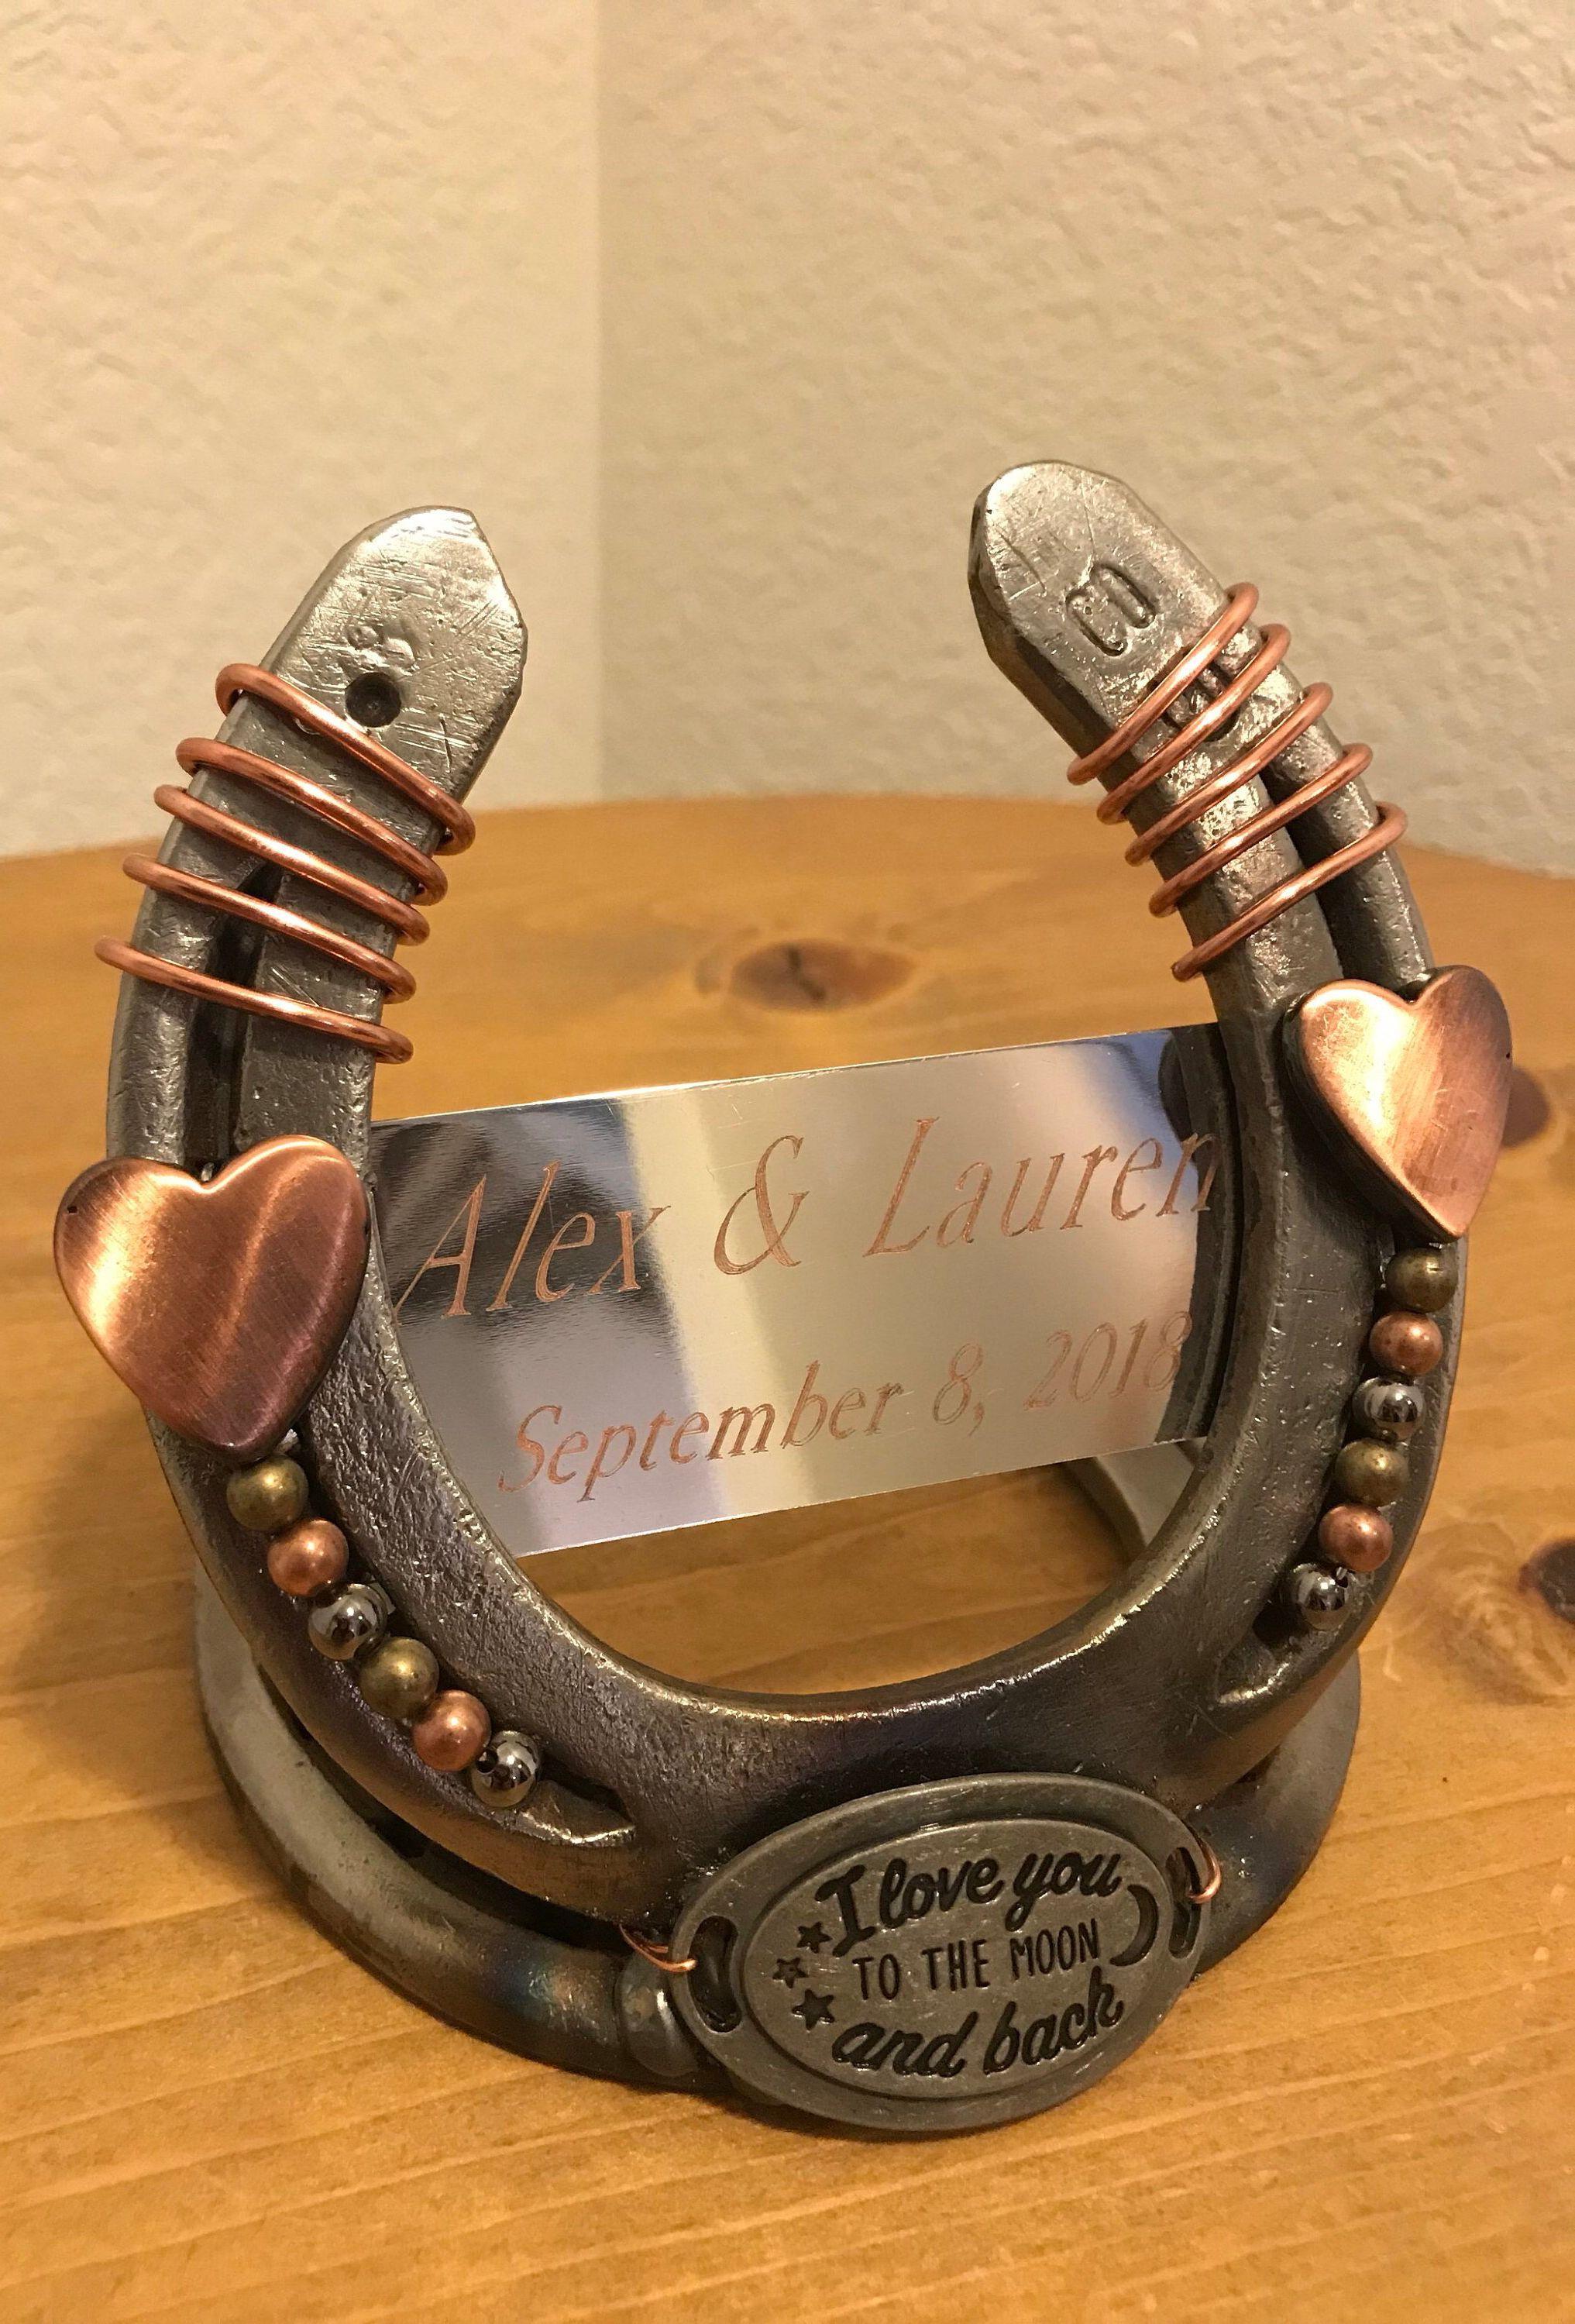 Wedding Gift Decorative Horseshoe Gift For Couple Good Luck